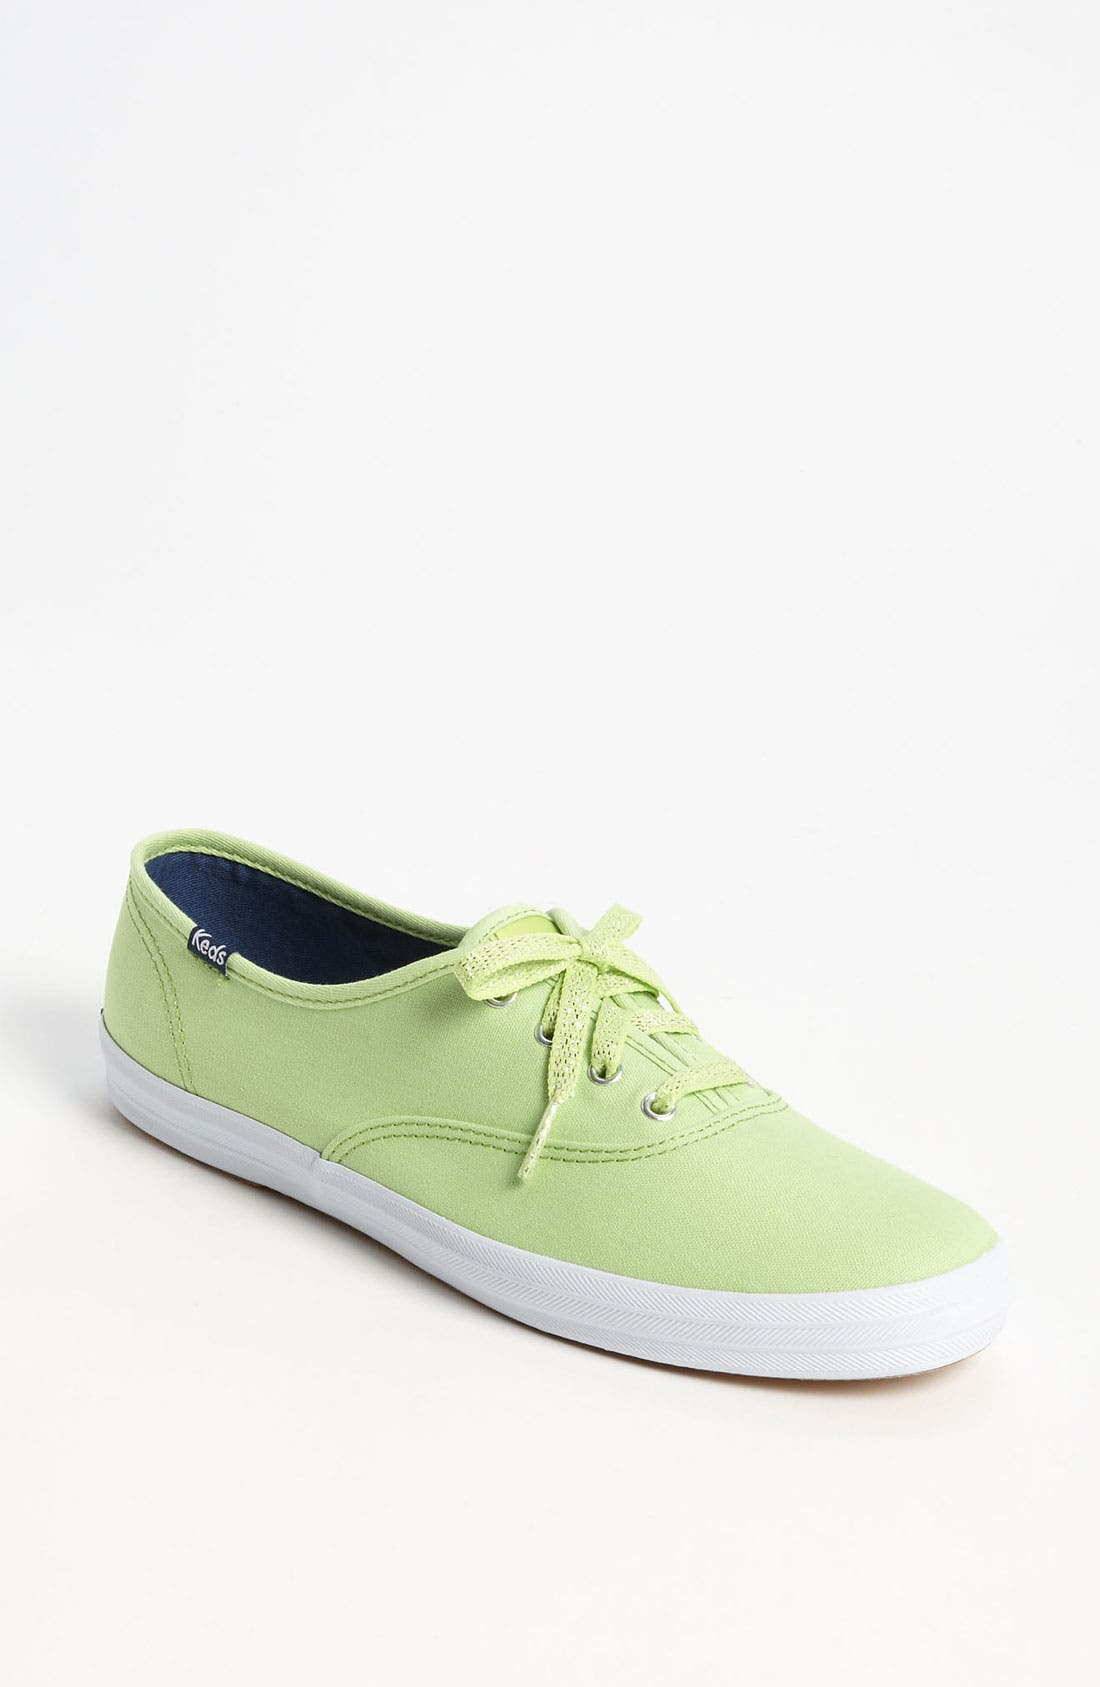 Alternate Image 1 Selected - Keds® 'Champion - Bright' Sneaker (Women)